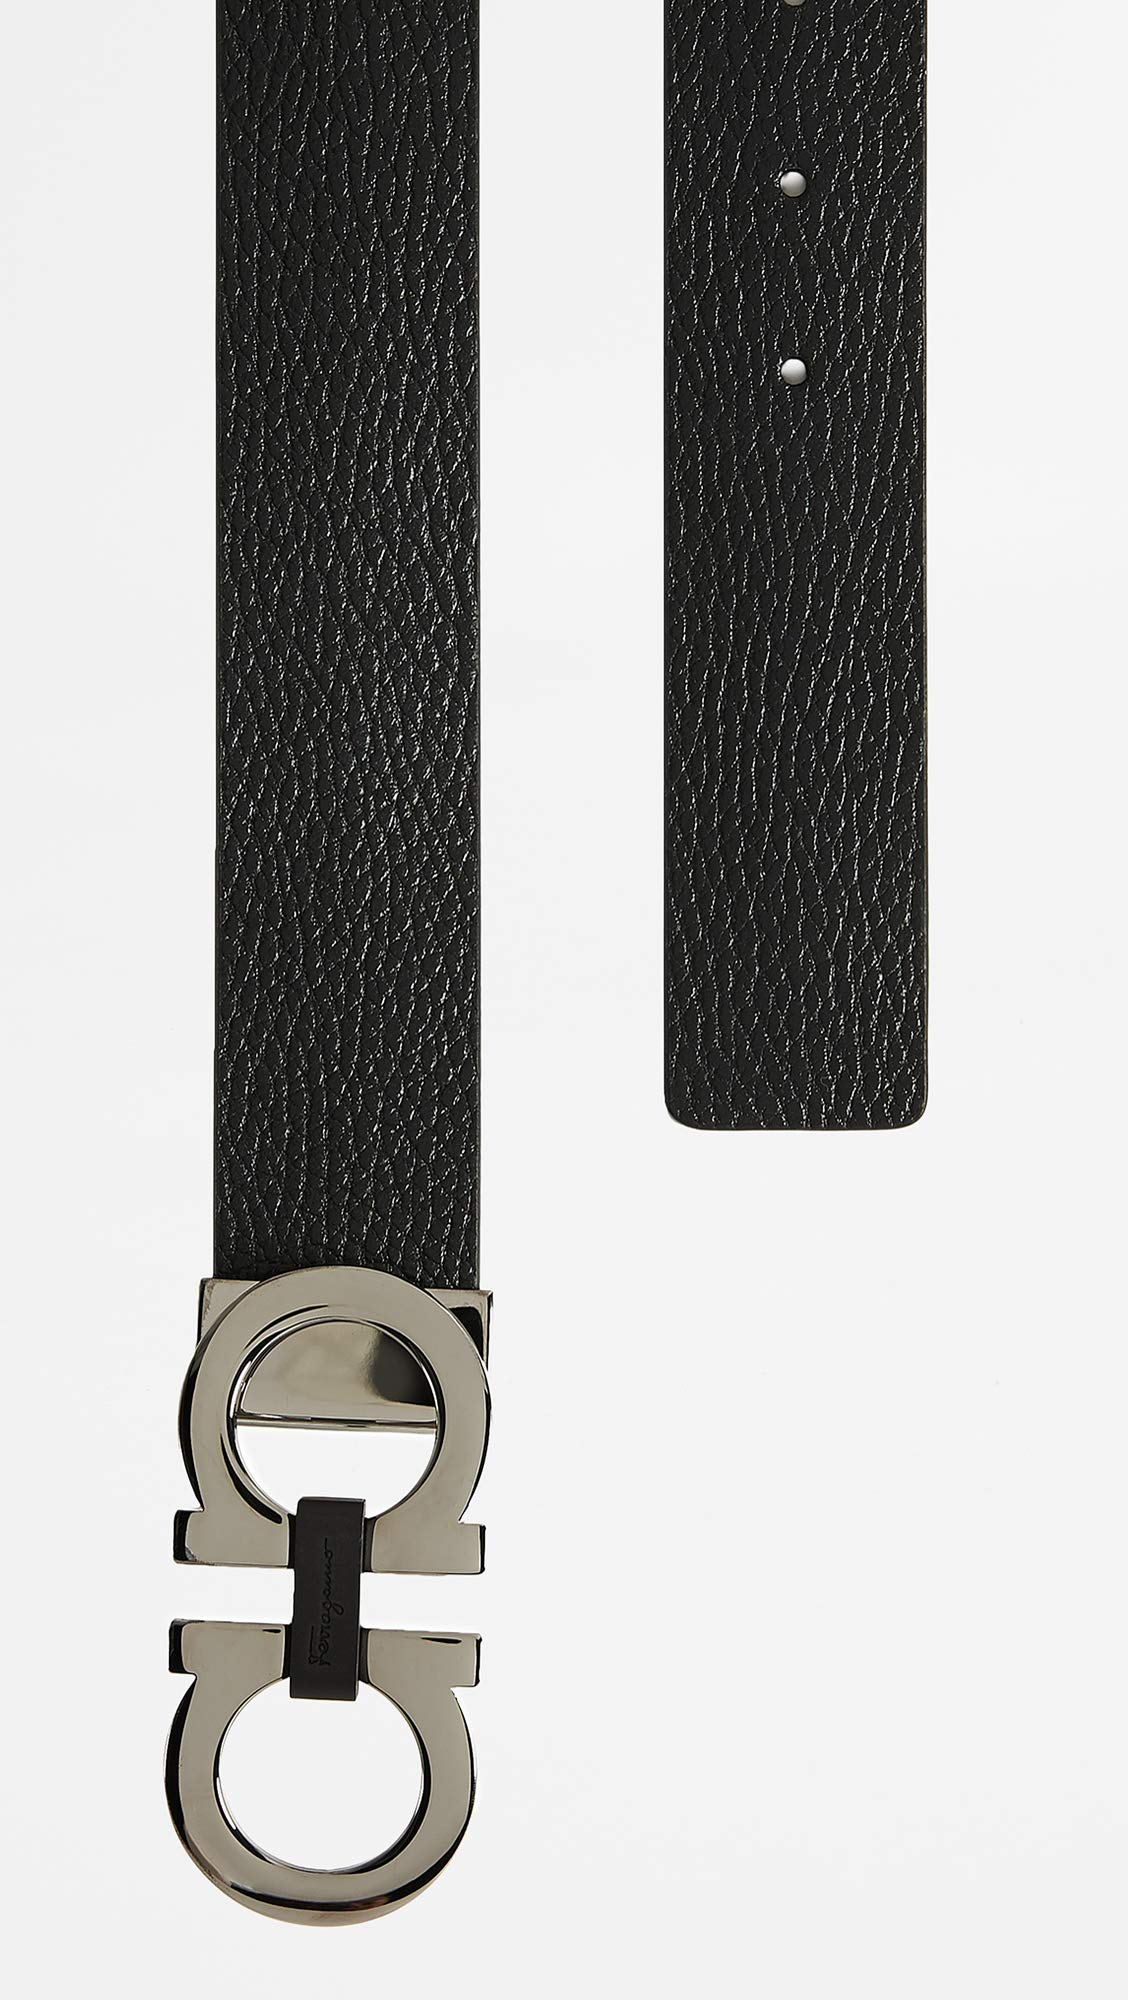 Salvatore Ferragamo Men's Reversible/Adjustable Belt-678783, Nero/Hickory 36 by Salvatore Ferragamo (Image #3)